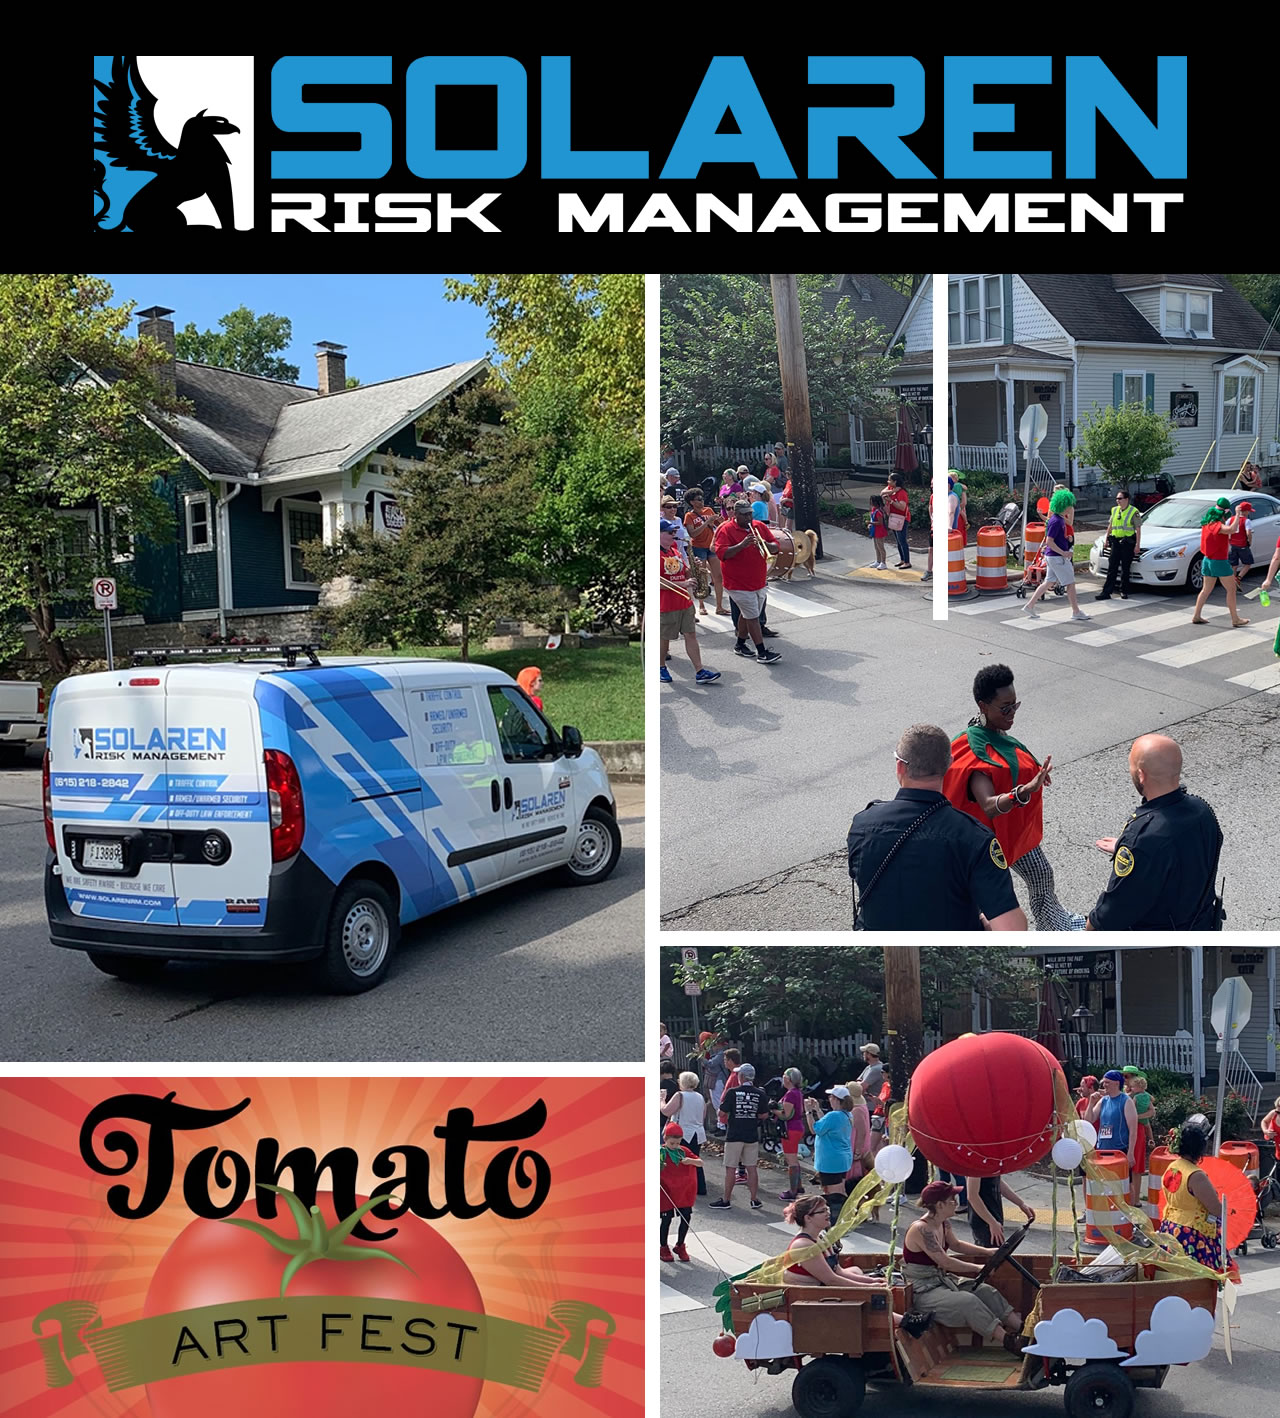 solaren-nashville-traffic-control-middle-tn-tomato-art-fest-2